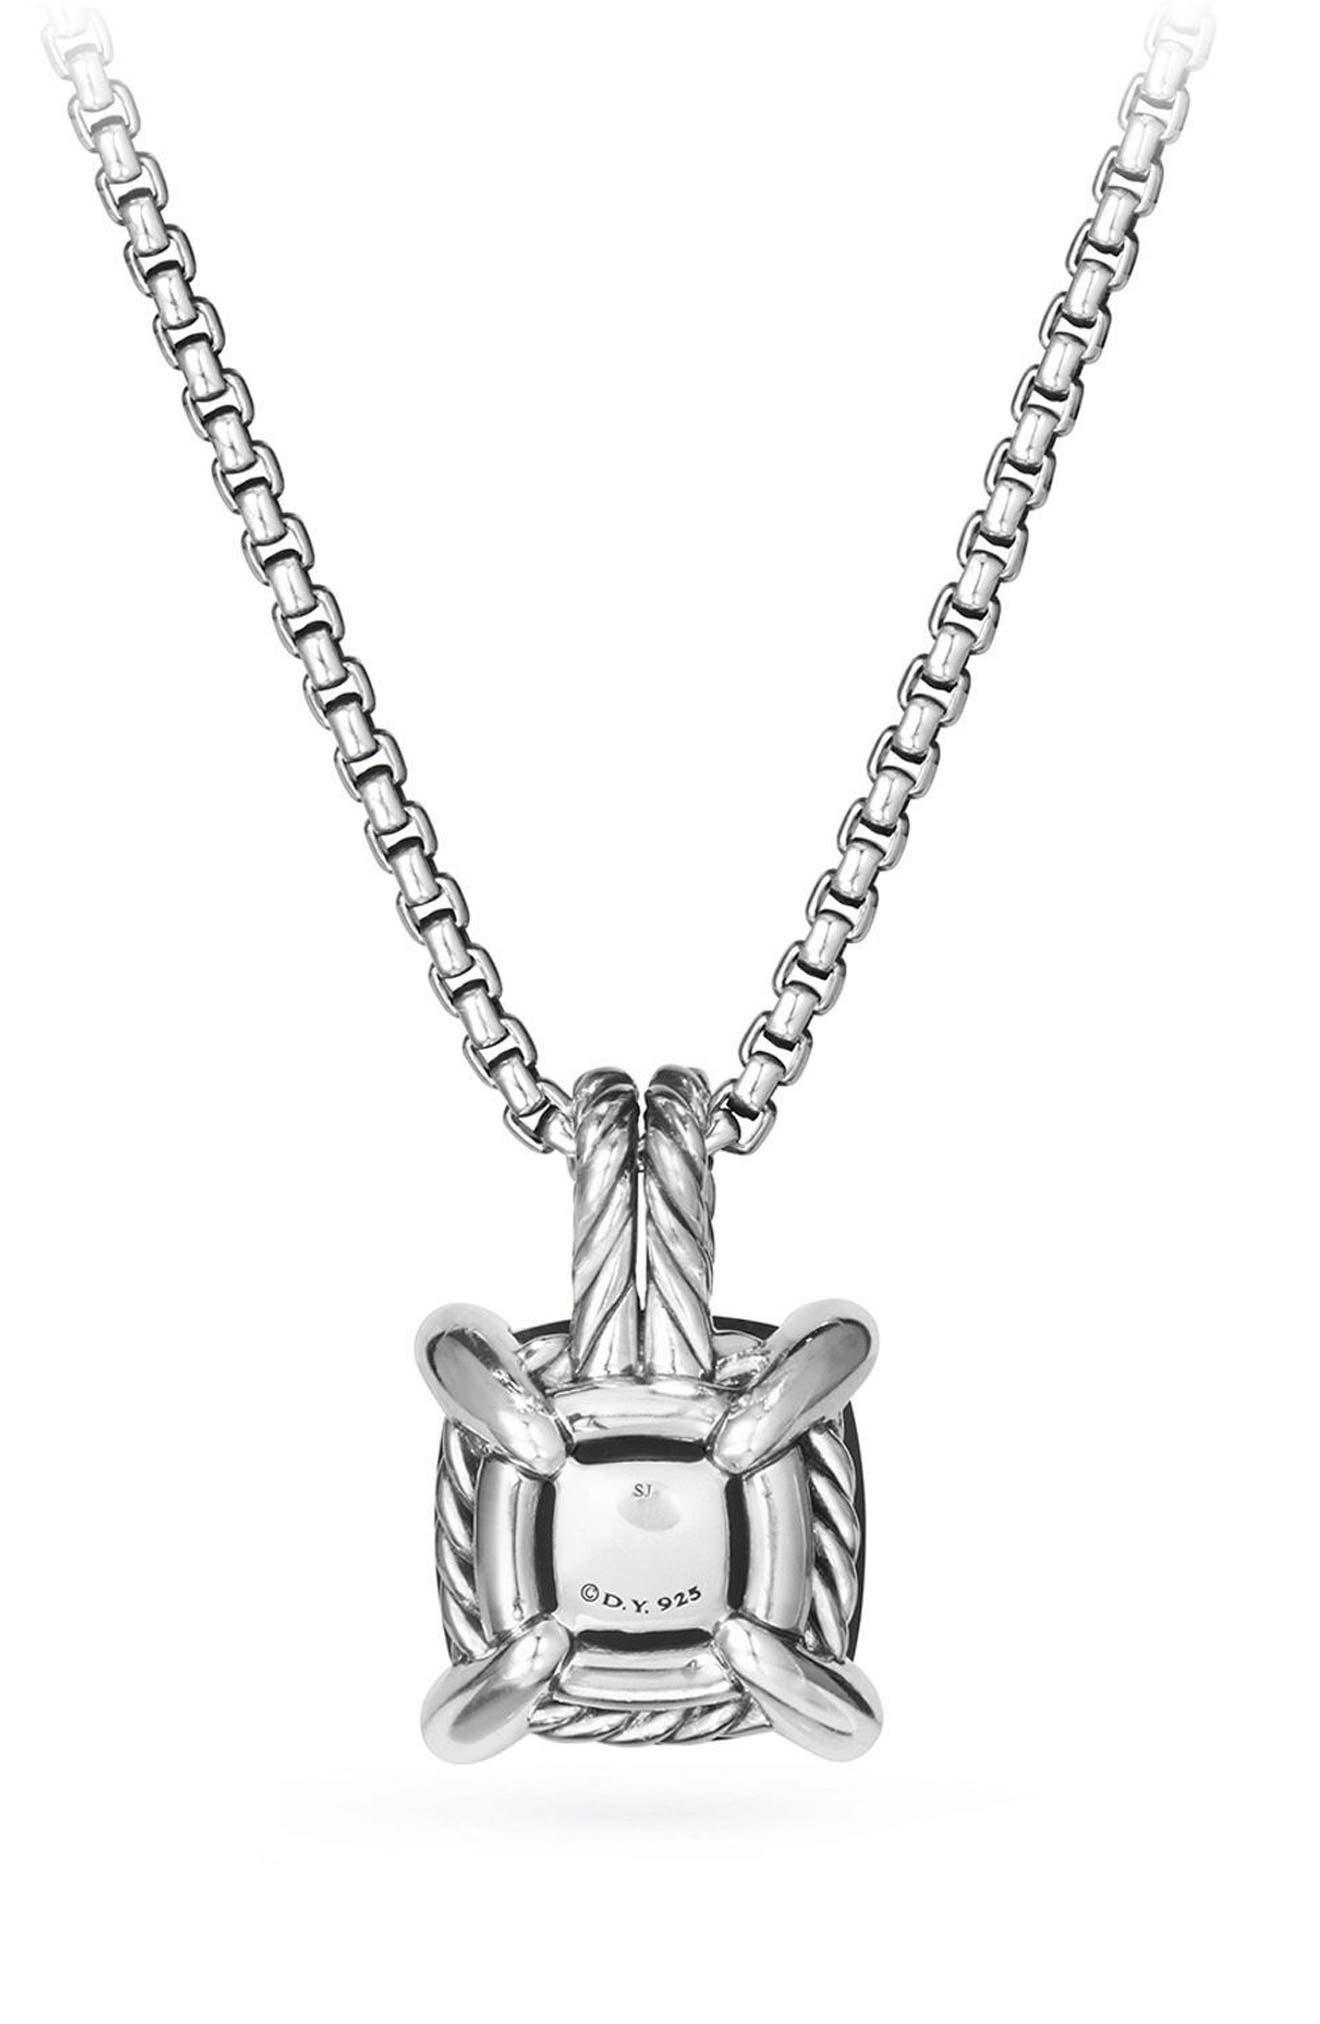 Châtelaine Pendant Necklace with Black Onyx and Diamonds,                             Alternate thumbnail 2, color,                             BLACK ONYX